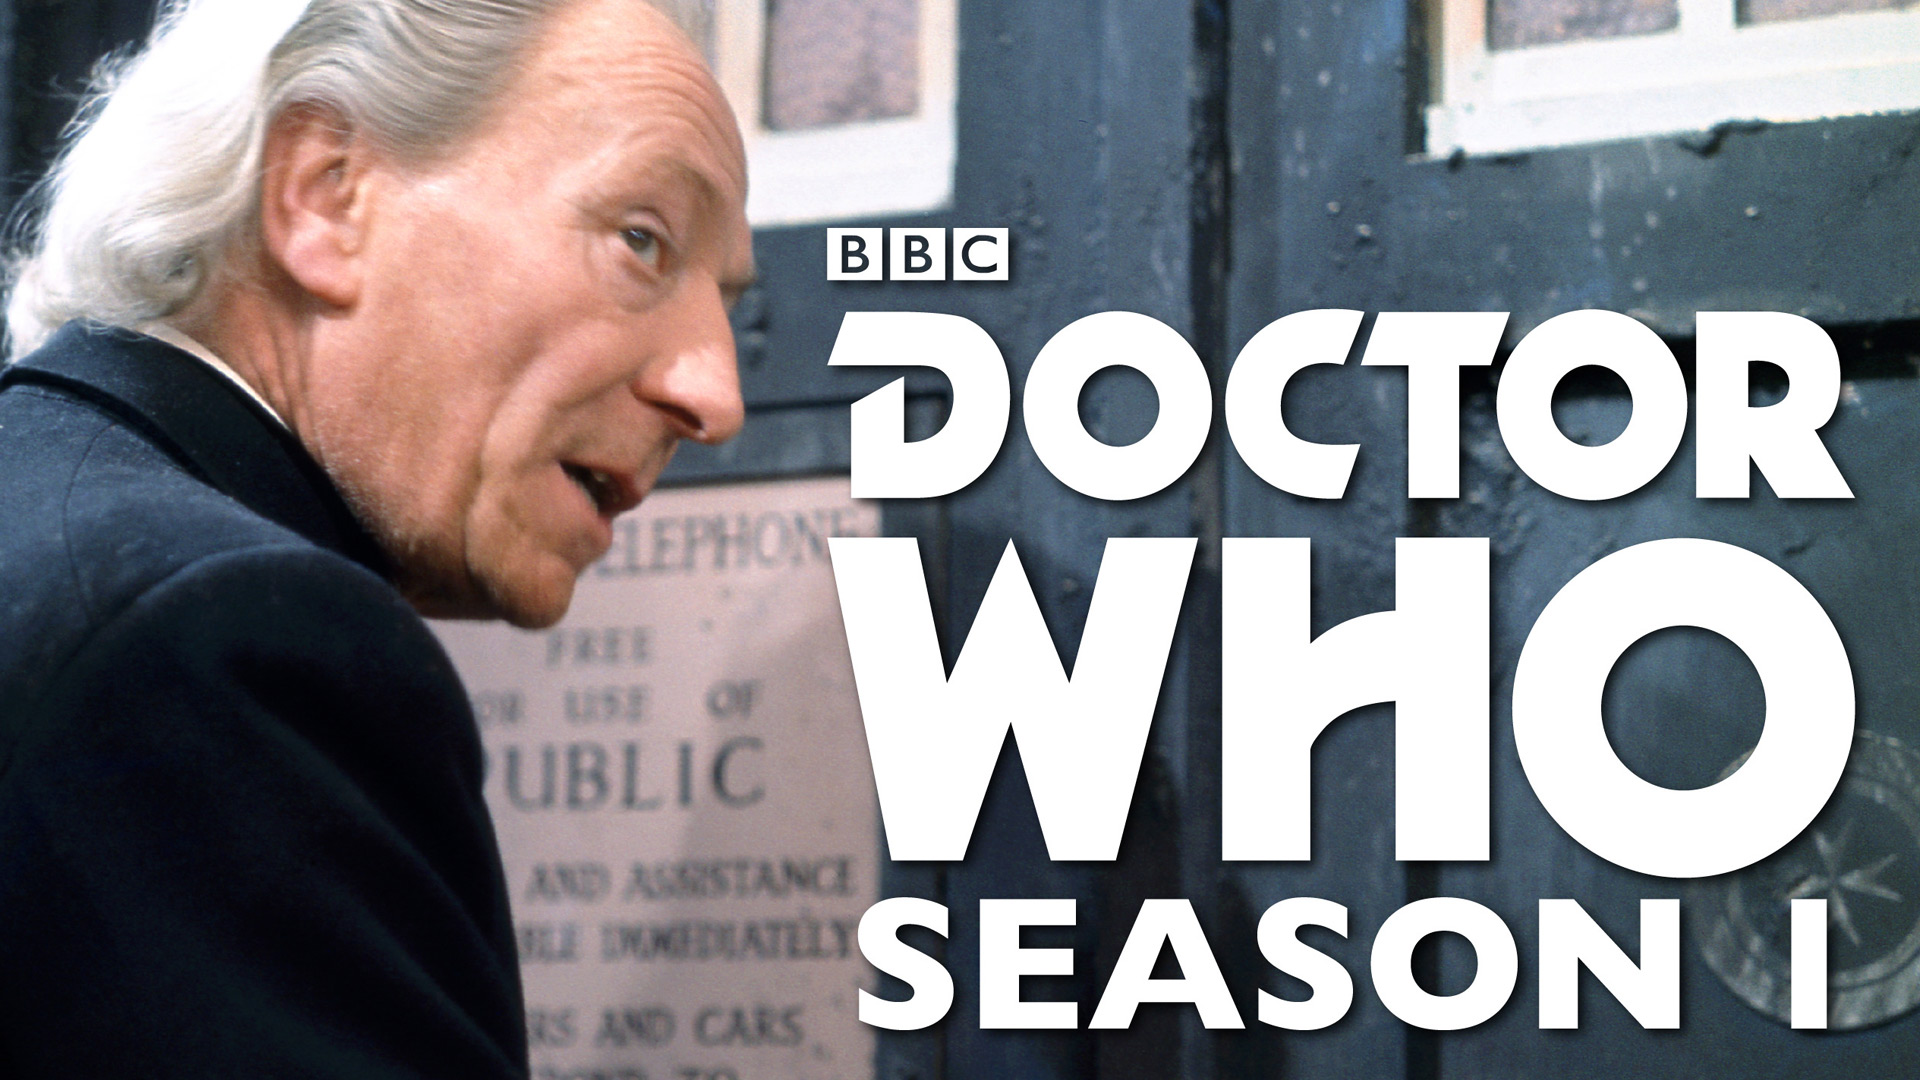 Classic Doctor Who, Season 1